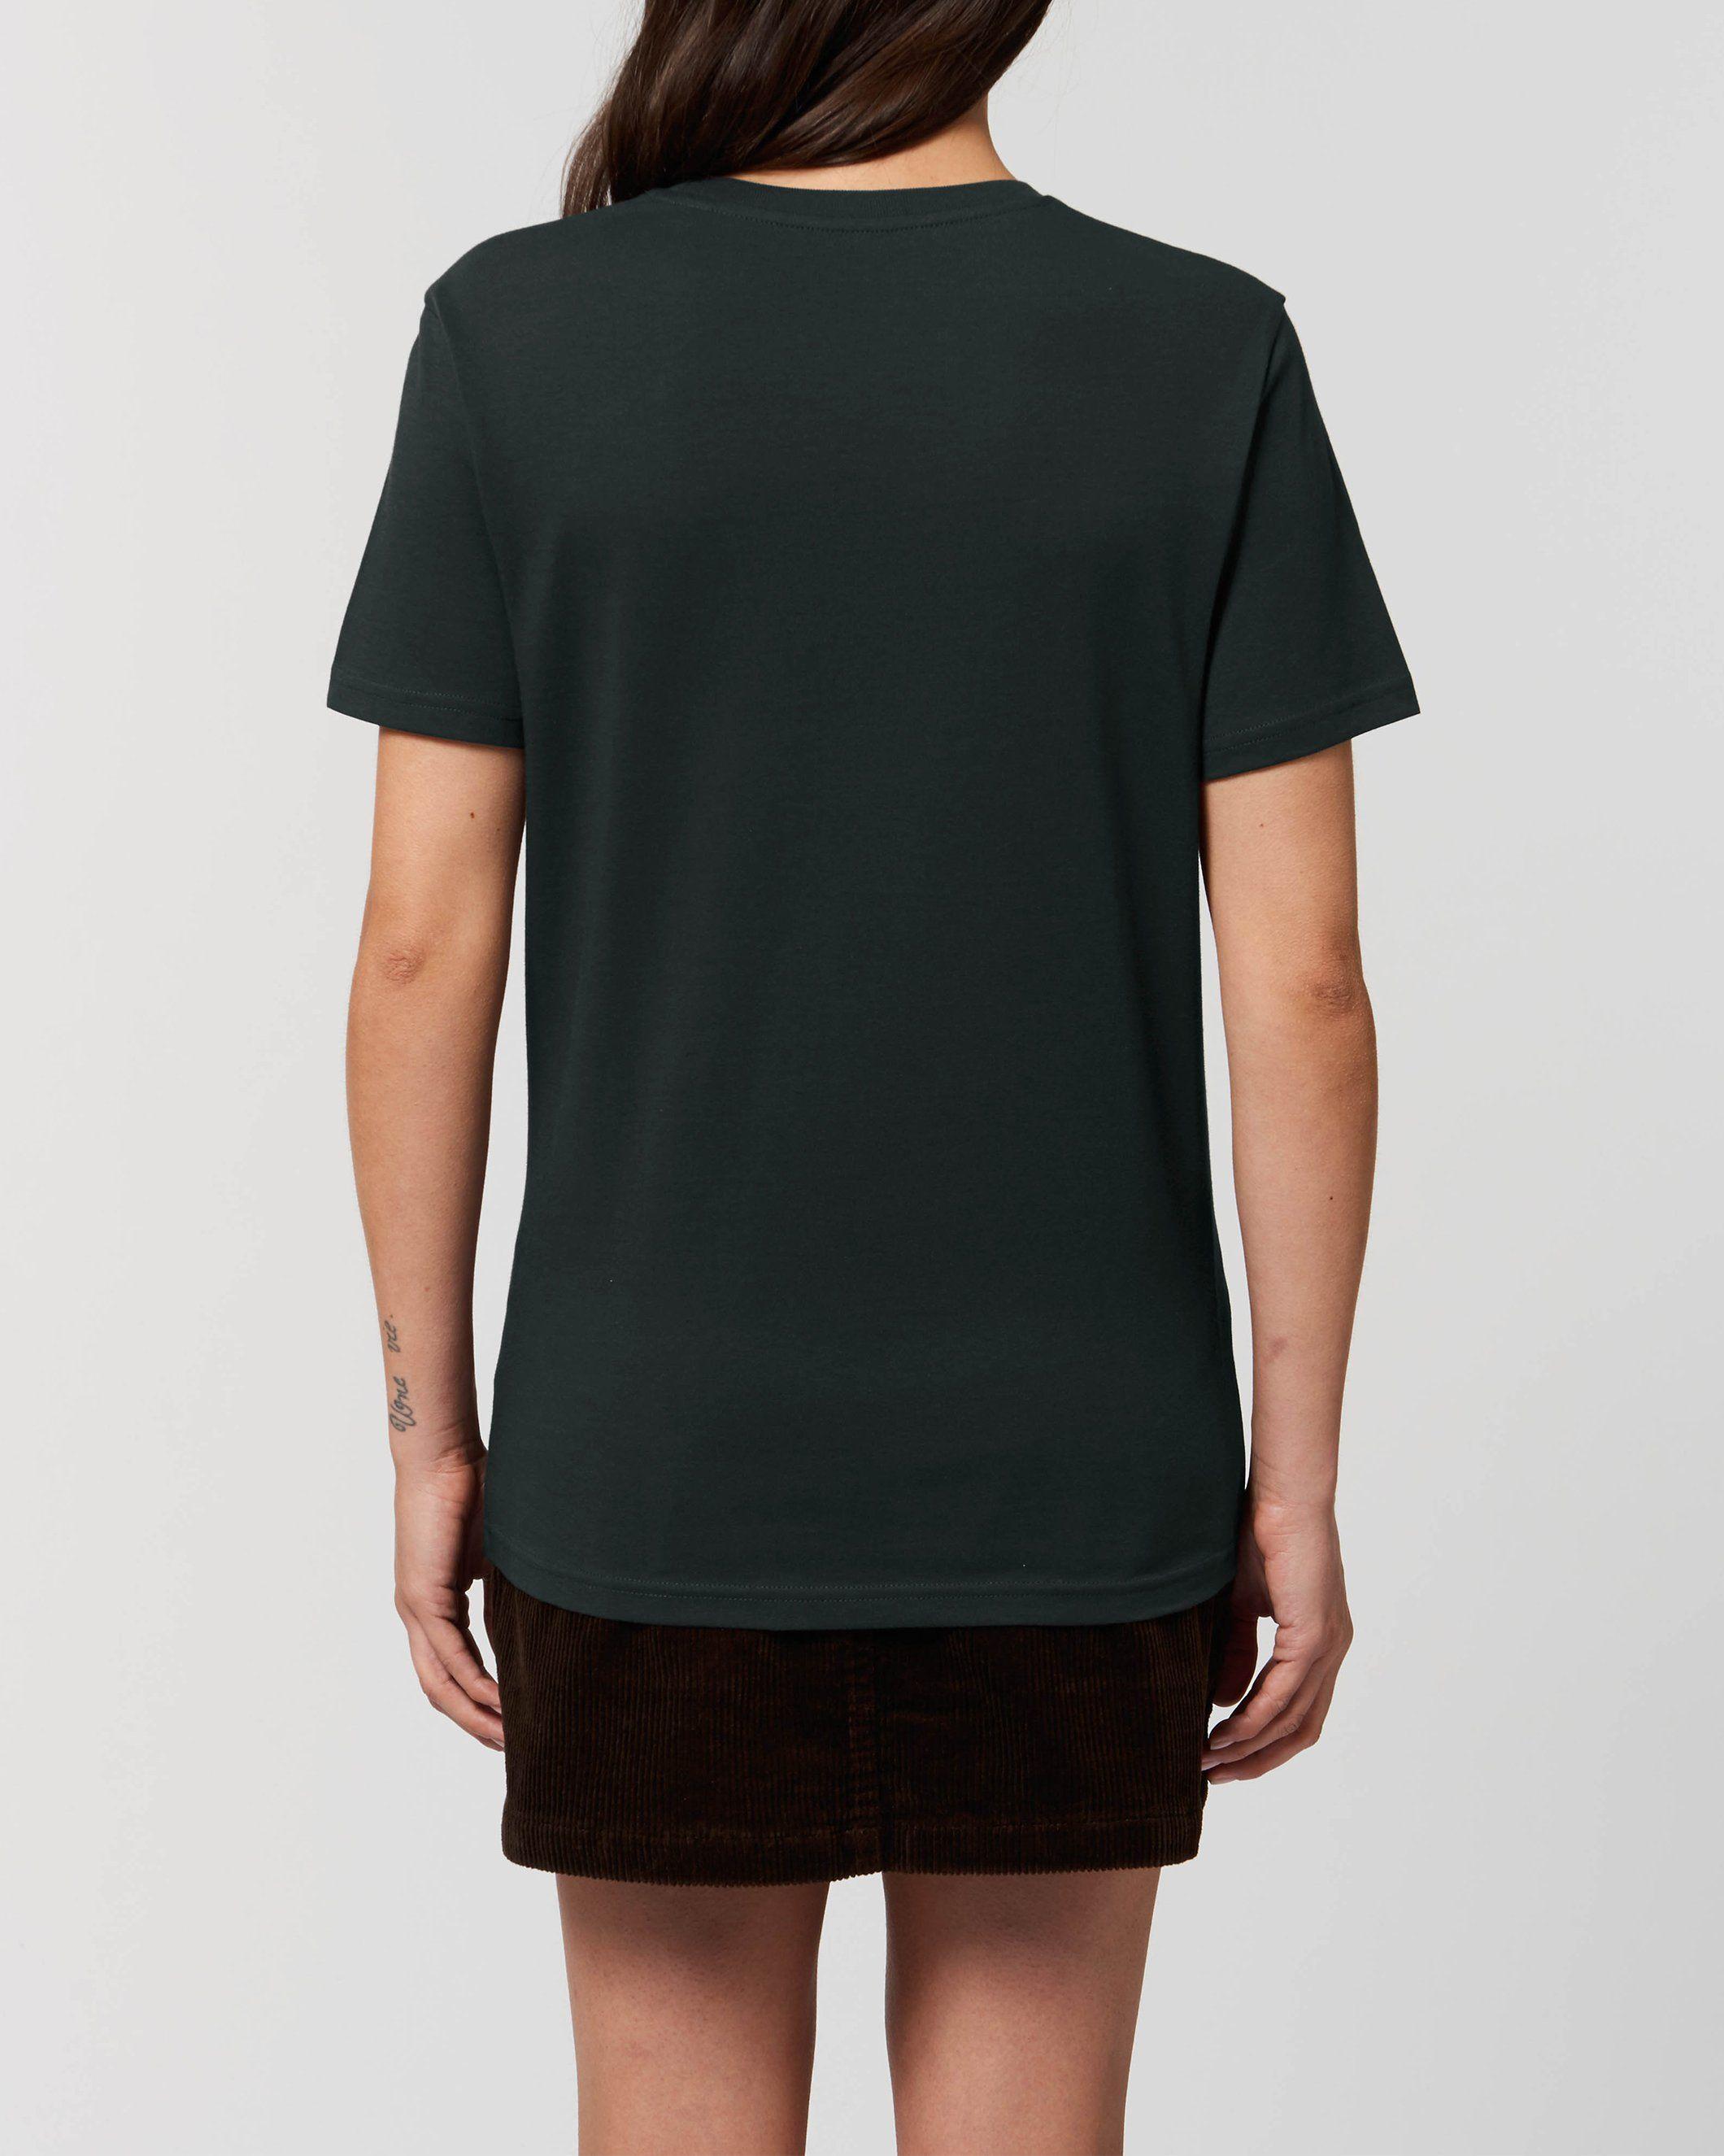 Nauli Unisex Regular Fit T-Shirt in Black